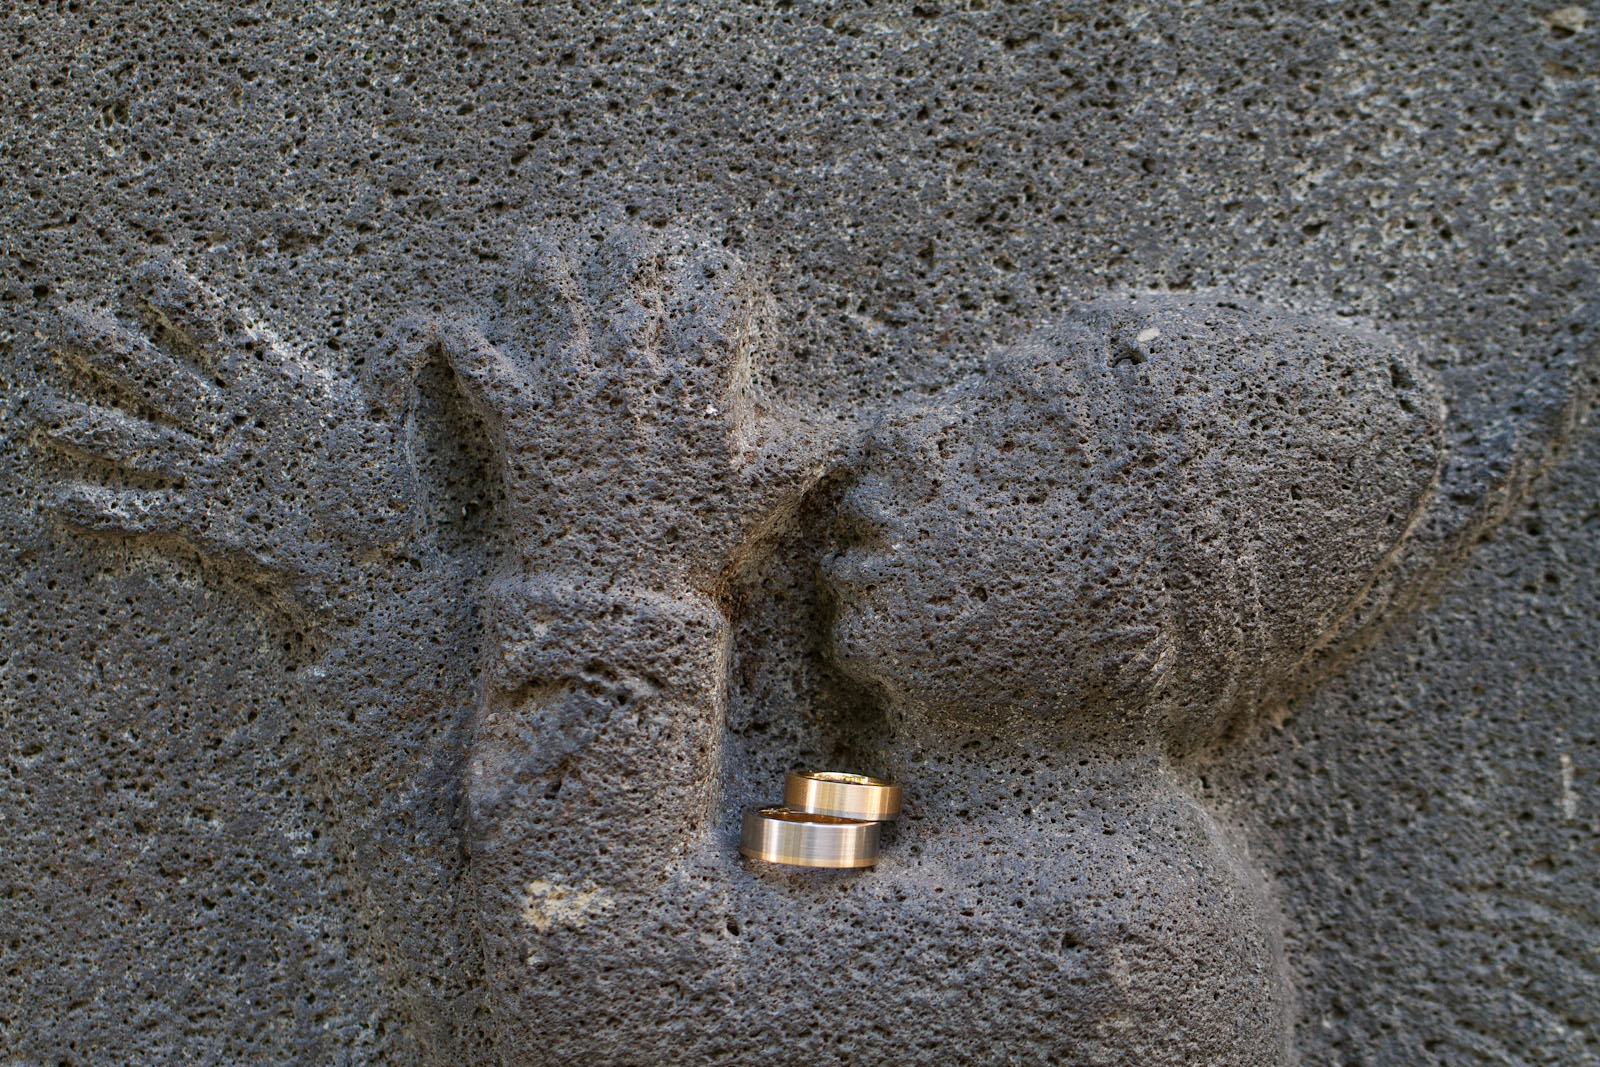 weddingshots.de: Trauringe am Schängelbrunnen in Koblenz